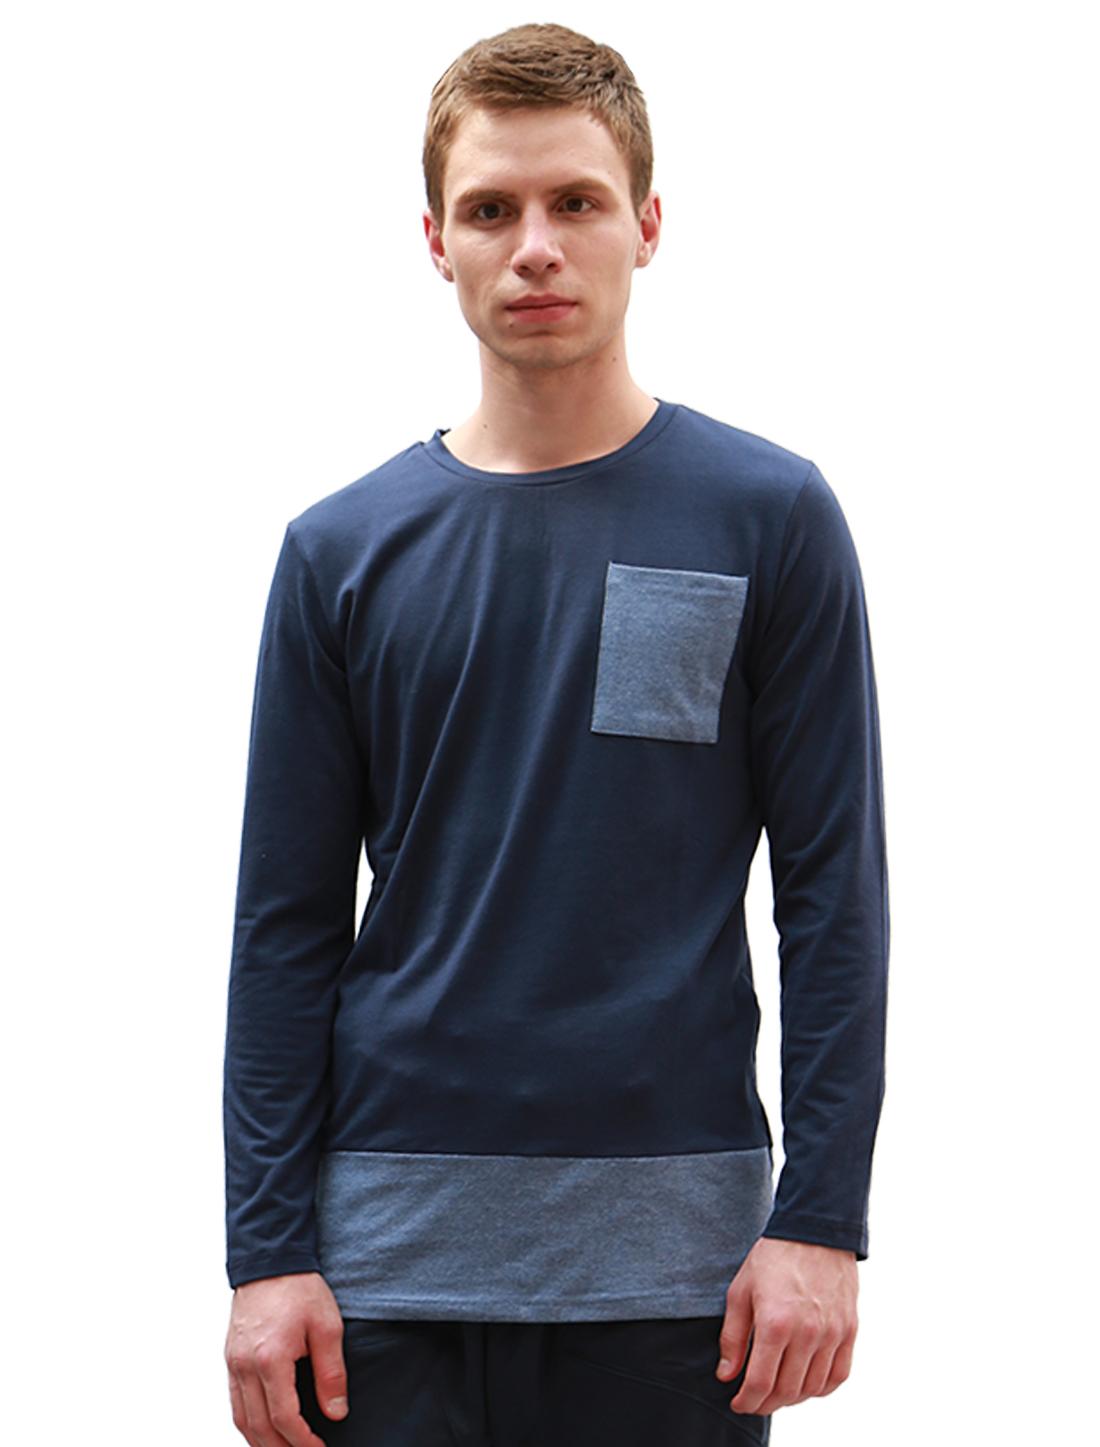 Men Contrast Color Longline Long Sleeve Crew Neck Tee Shirt Navy Blue S